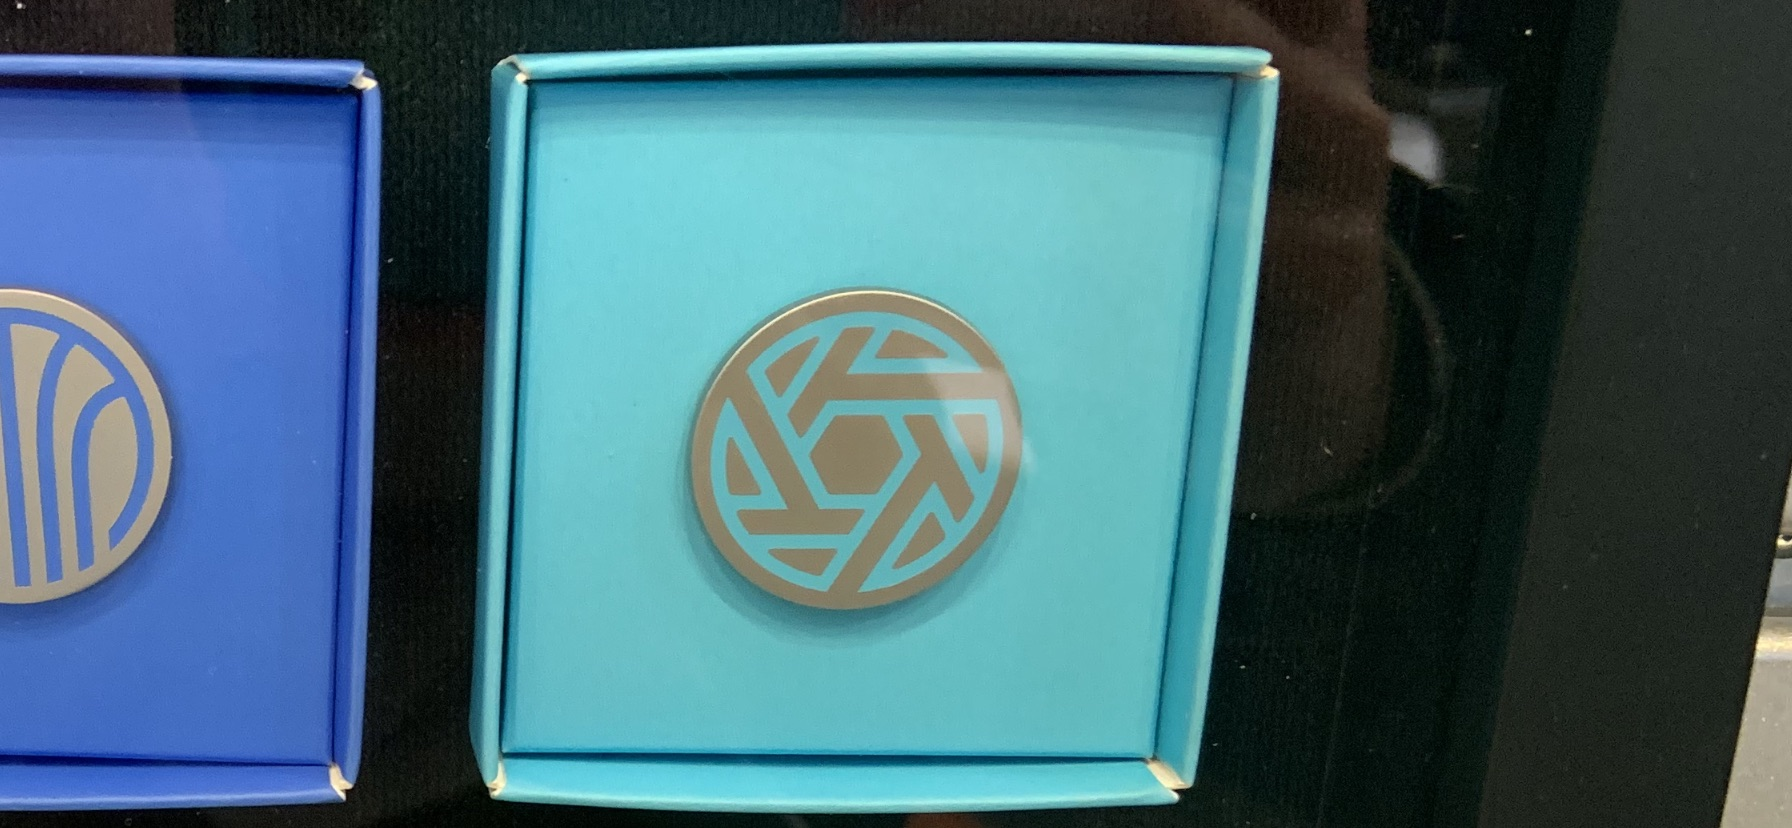 EPCOT pavilion logo pins 12/23/19 17